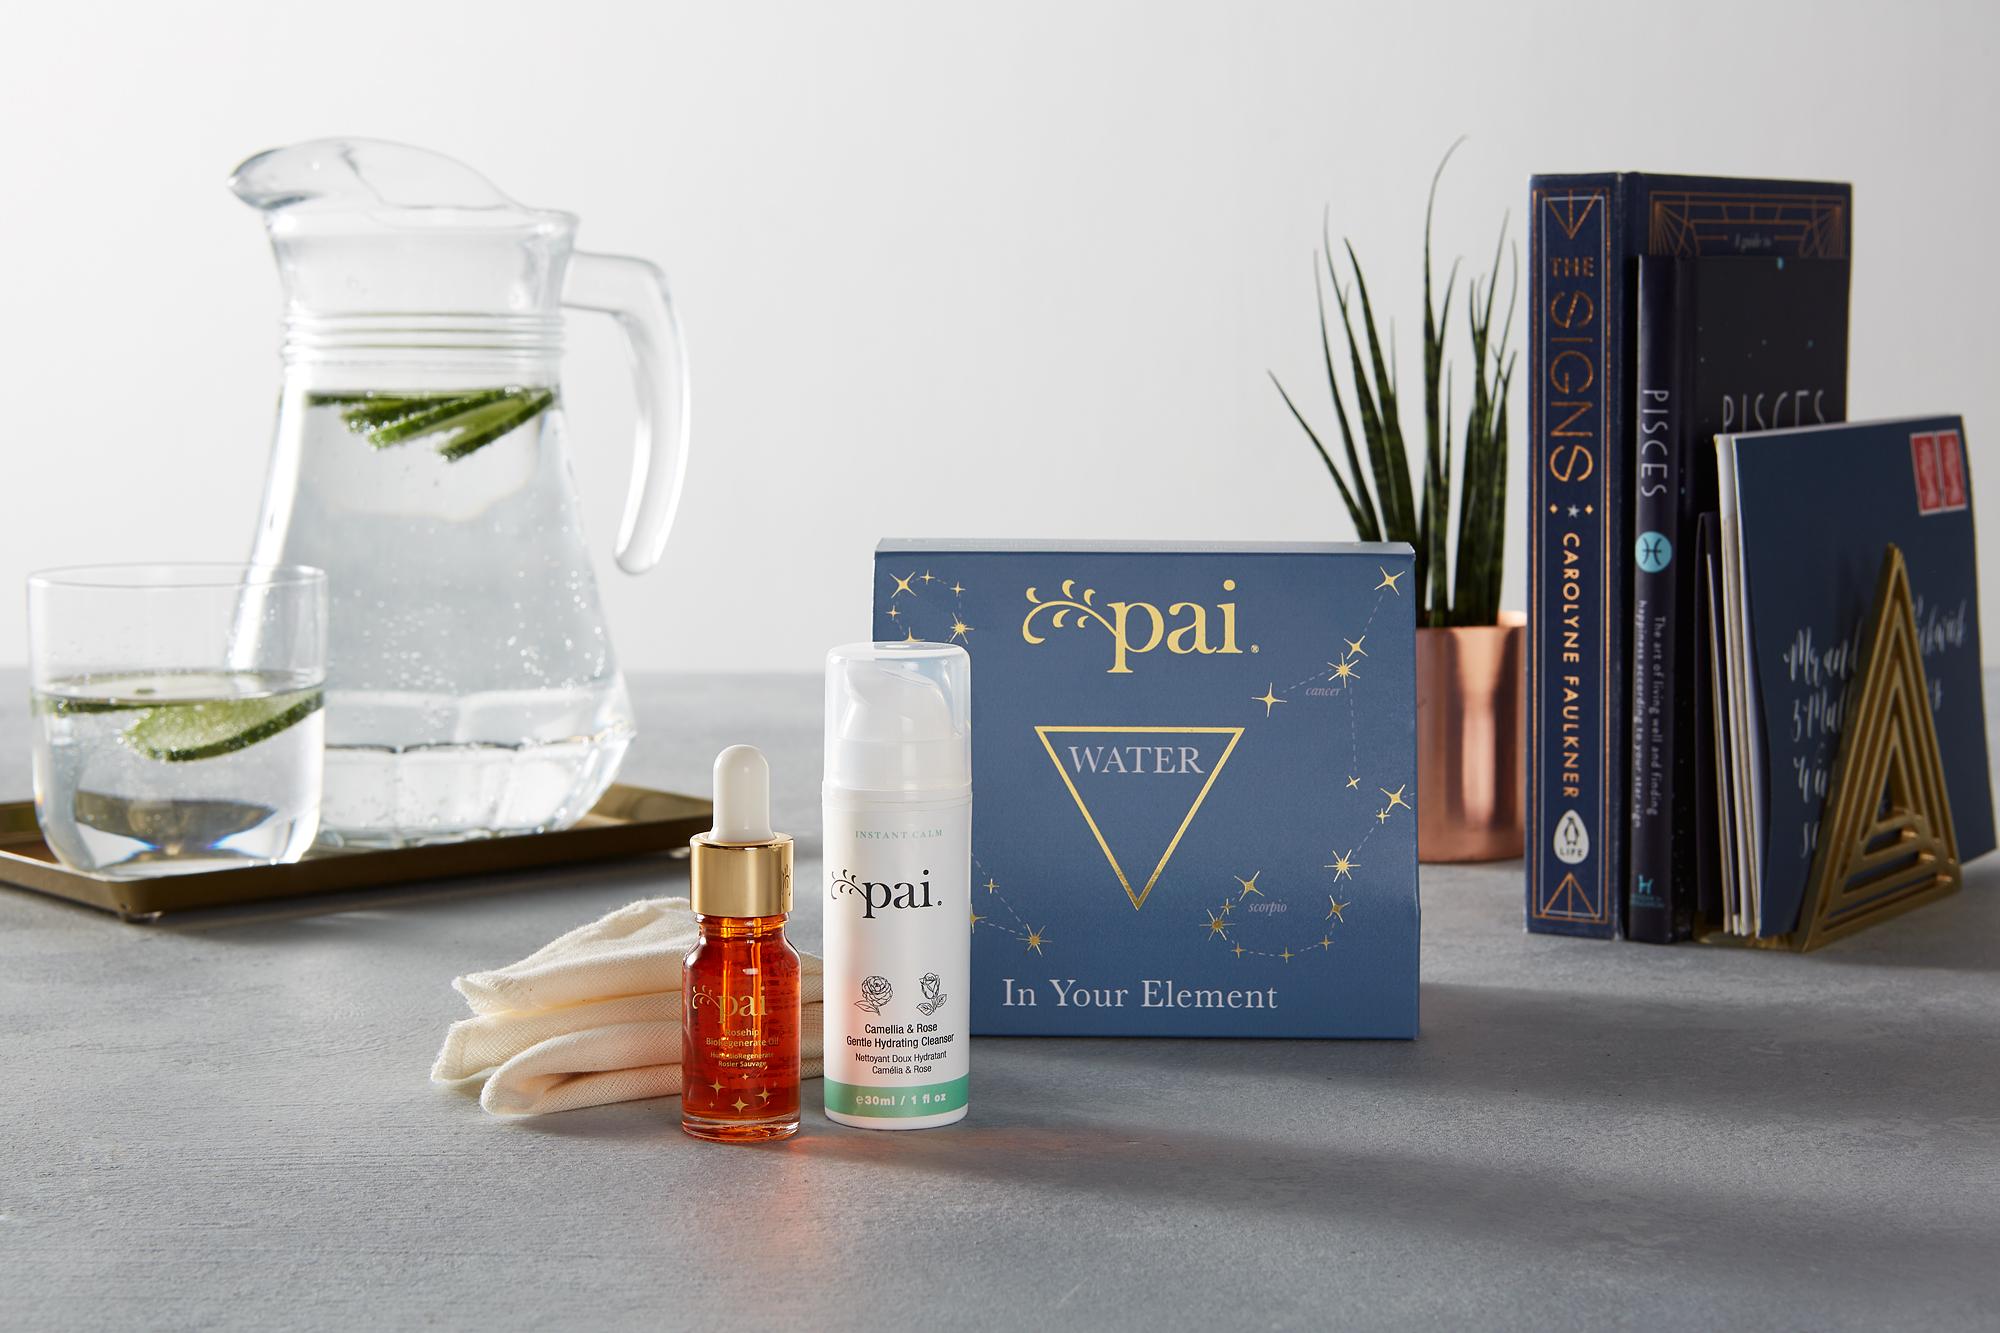 Pai Skin Care